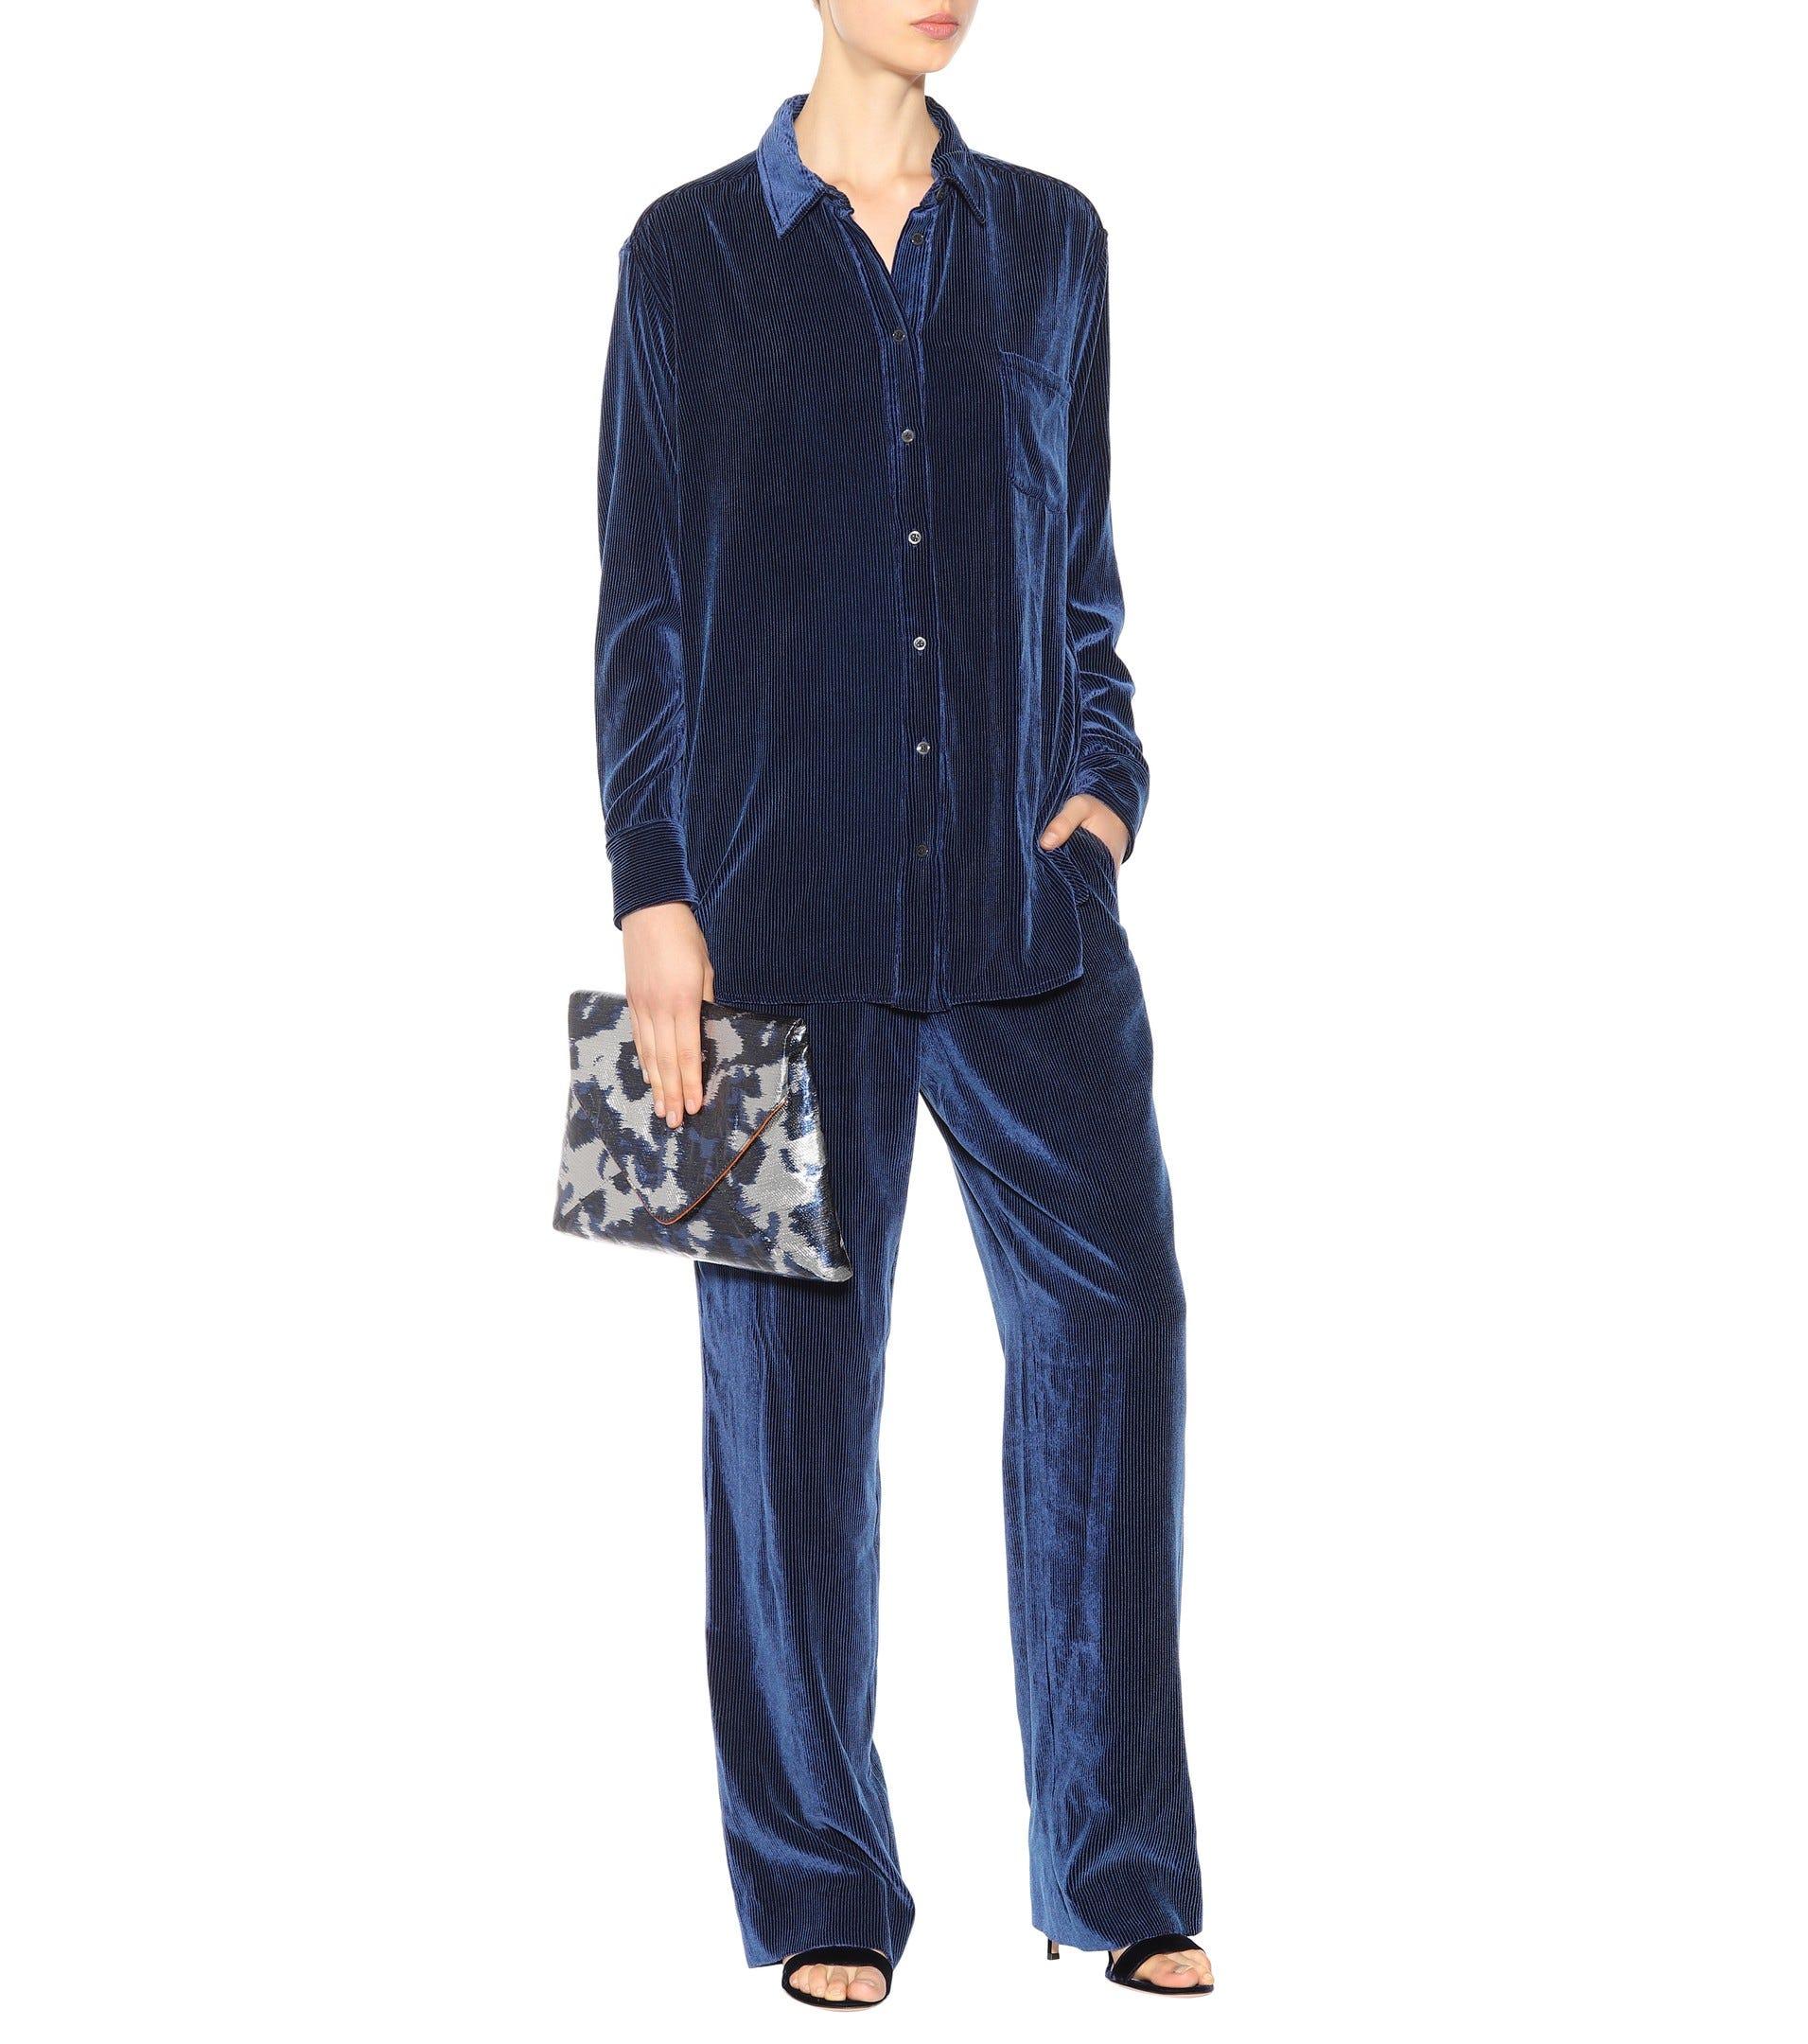 507e4a74759 How To Wear Corduroy Trend Fall 2017